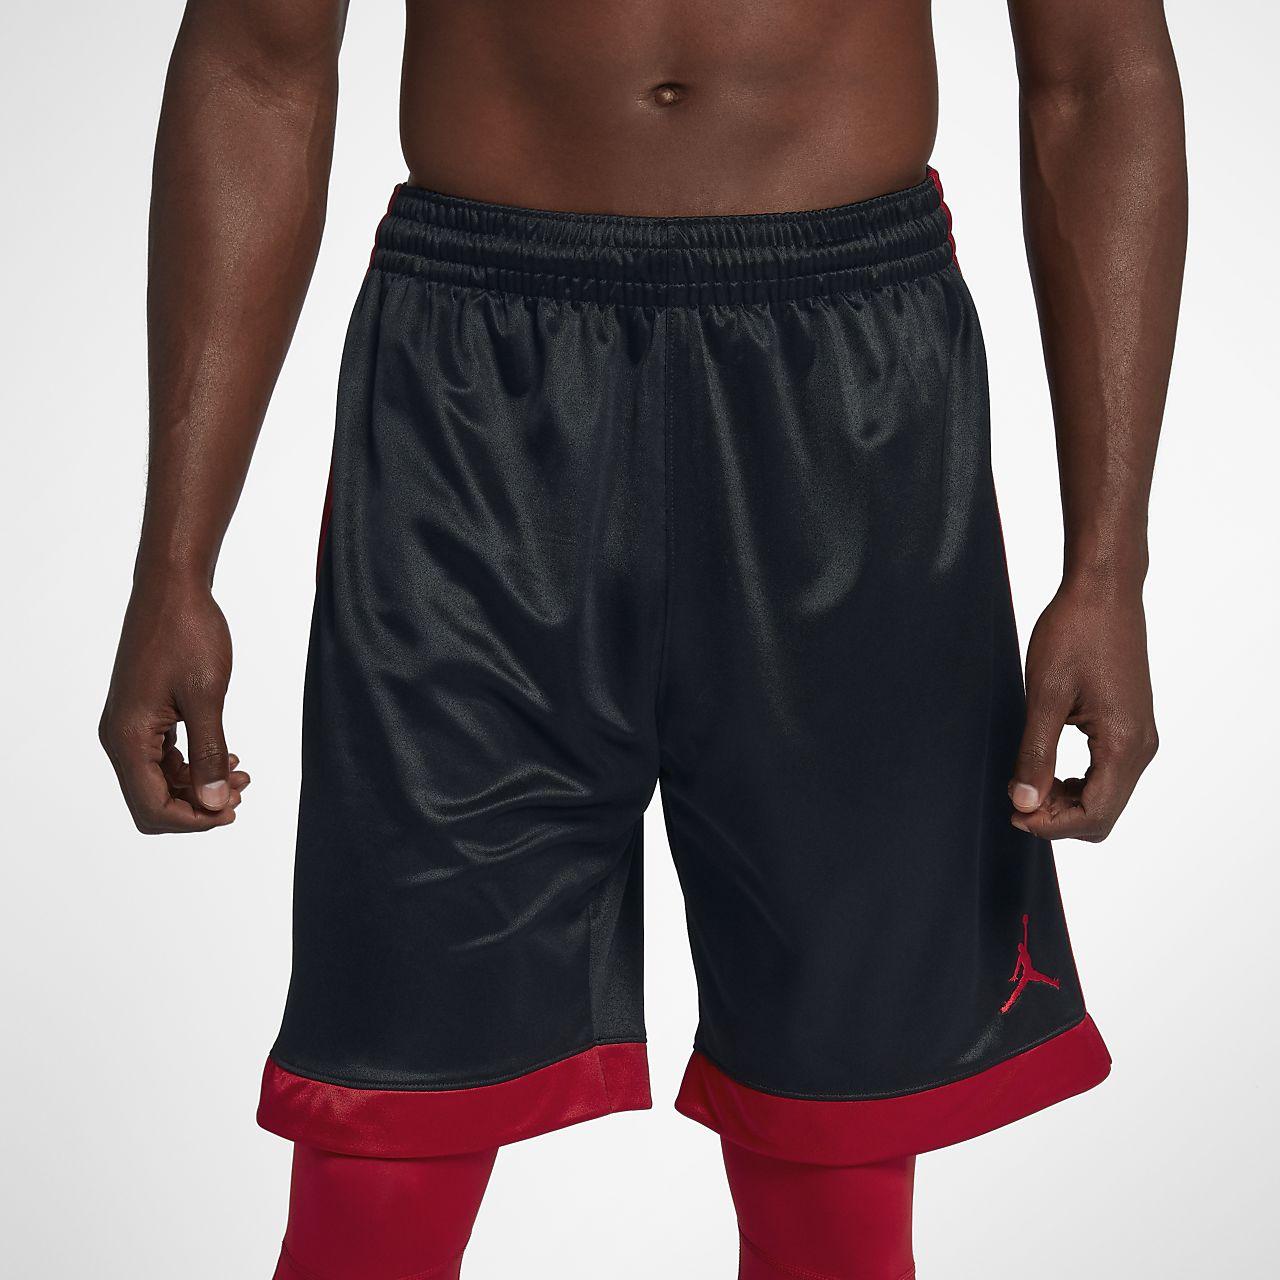 Jordan Shimmer Erkek Basketbol Şortu